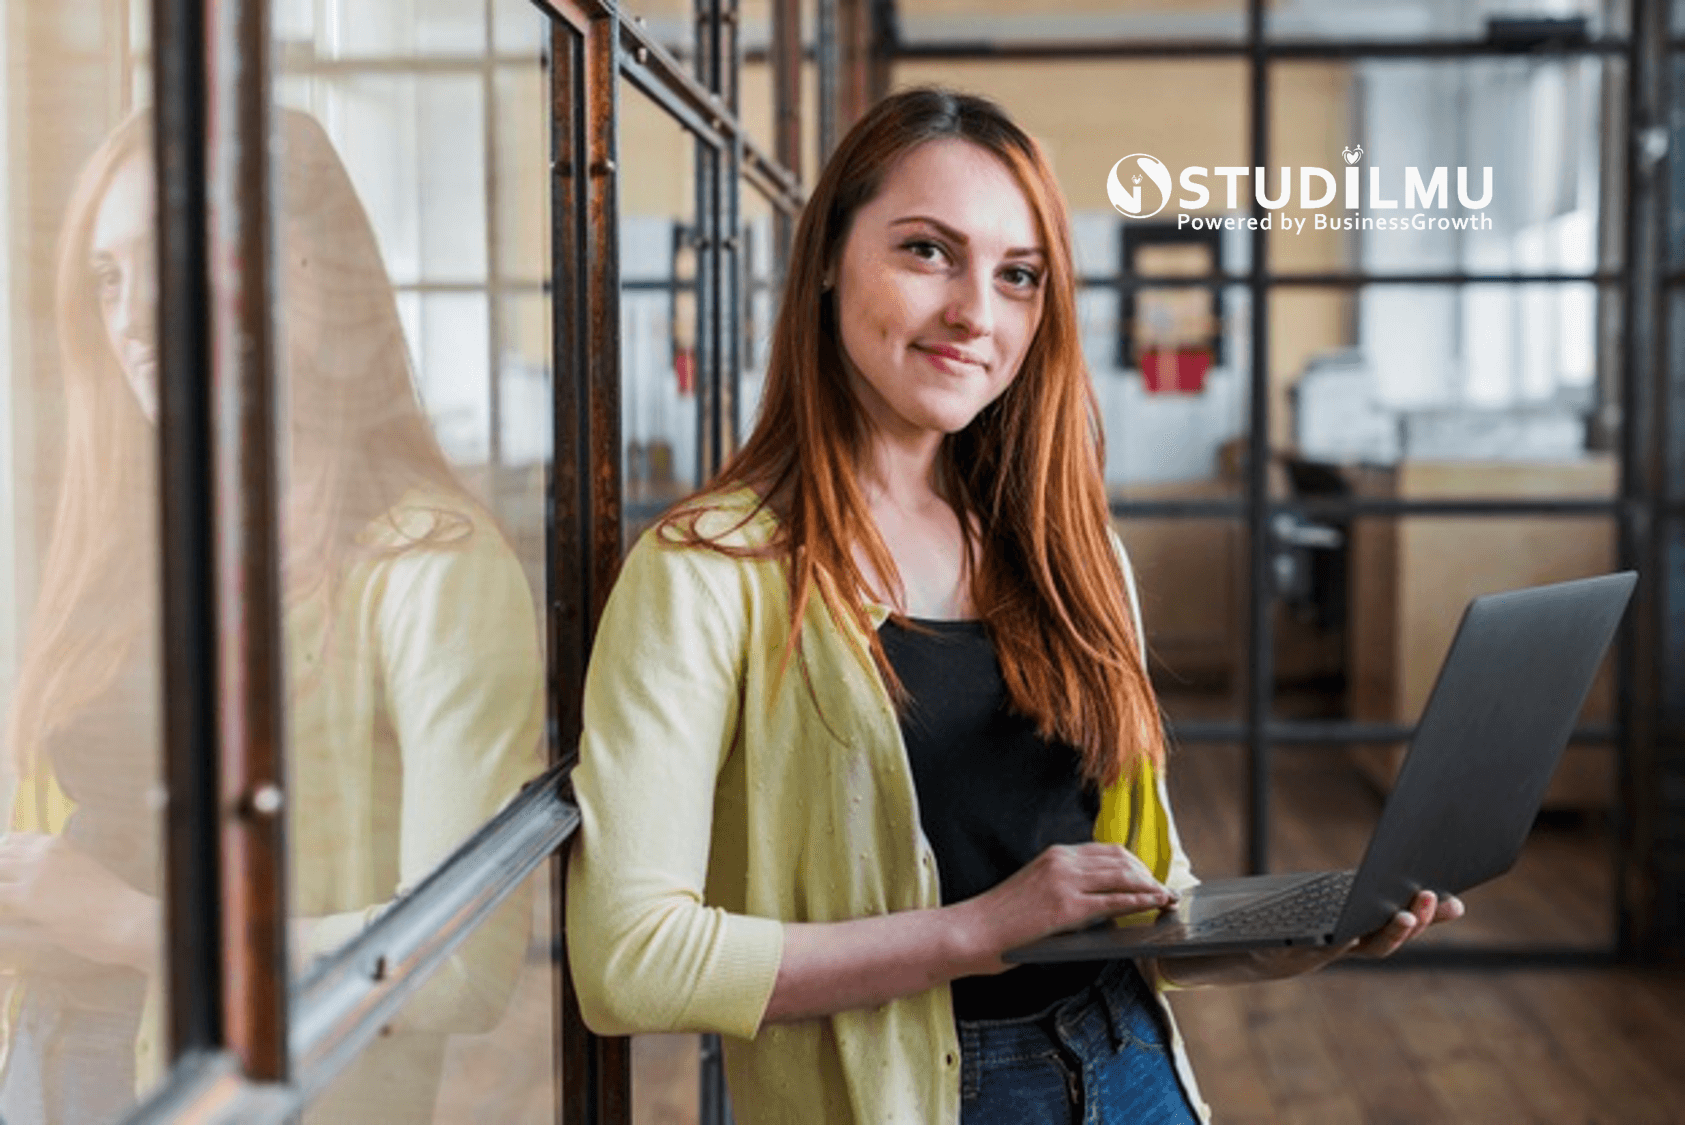 STUDILMU Career Advice - 10 Cara Teknologi Membajak Kepribadian Manusia